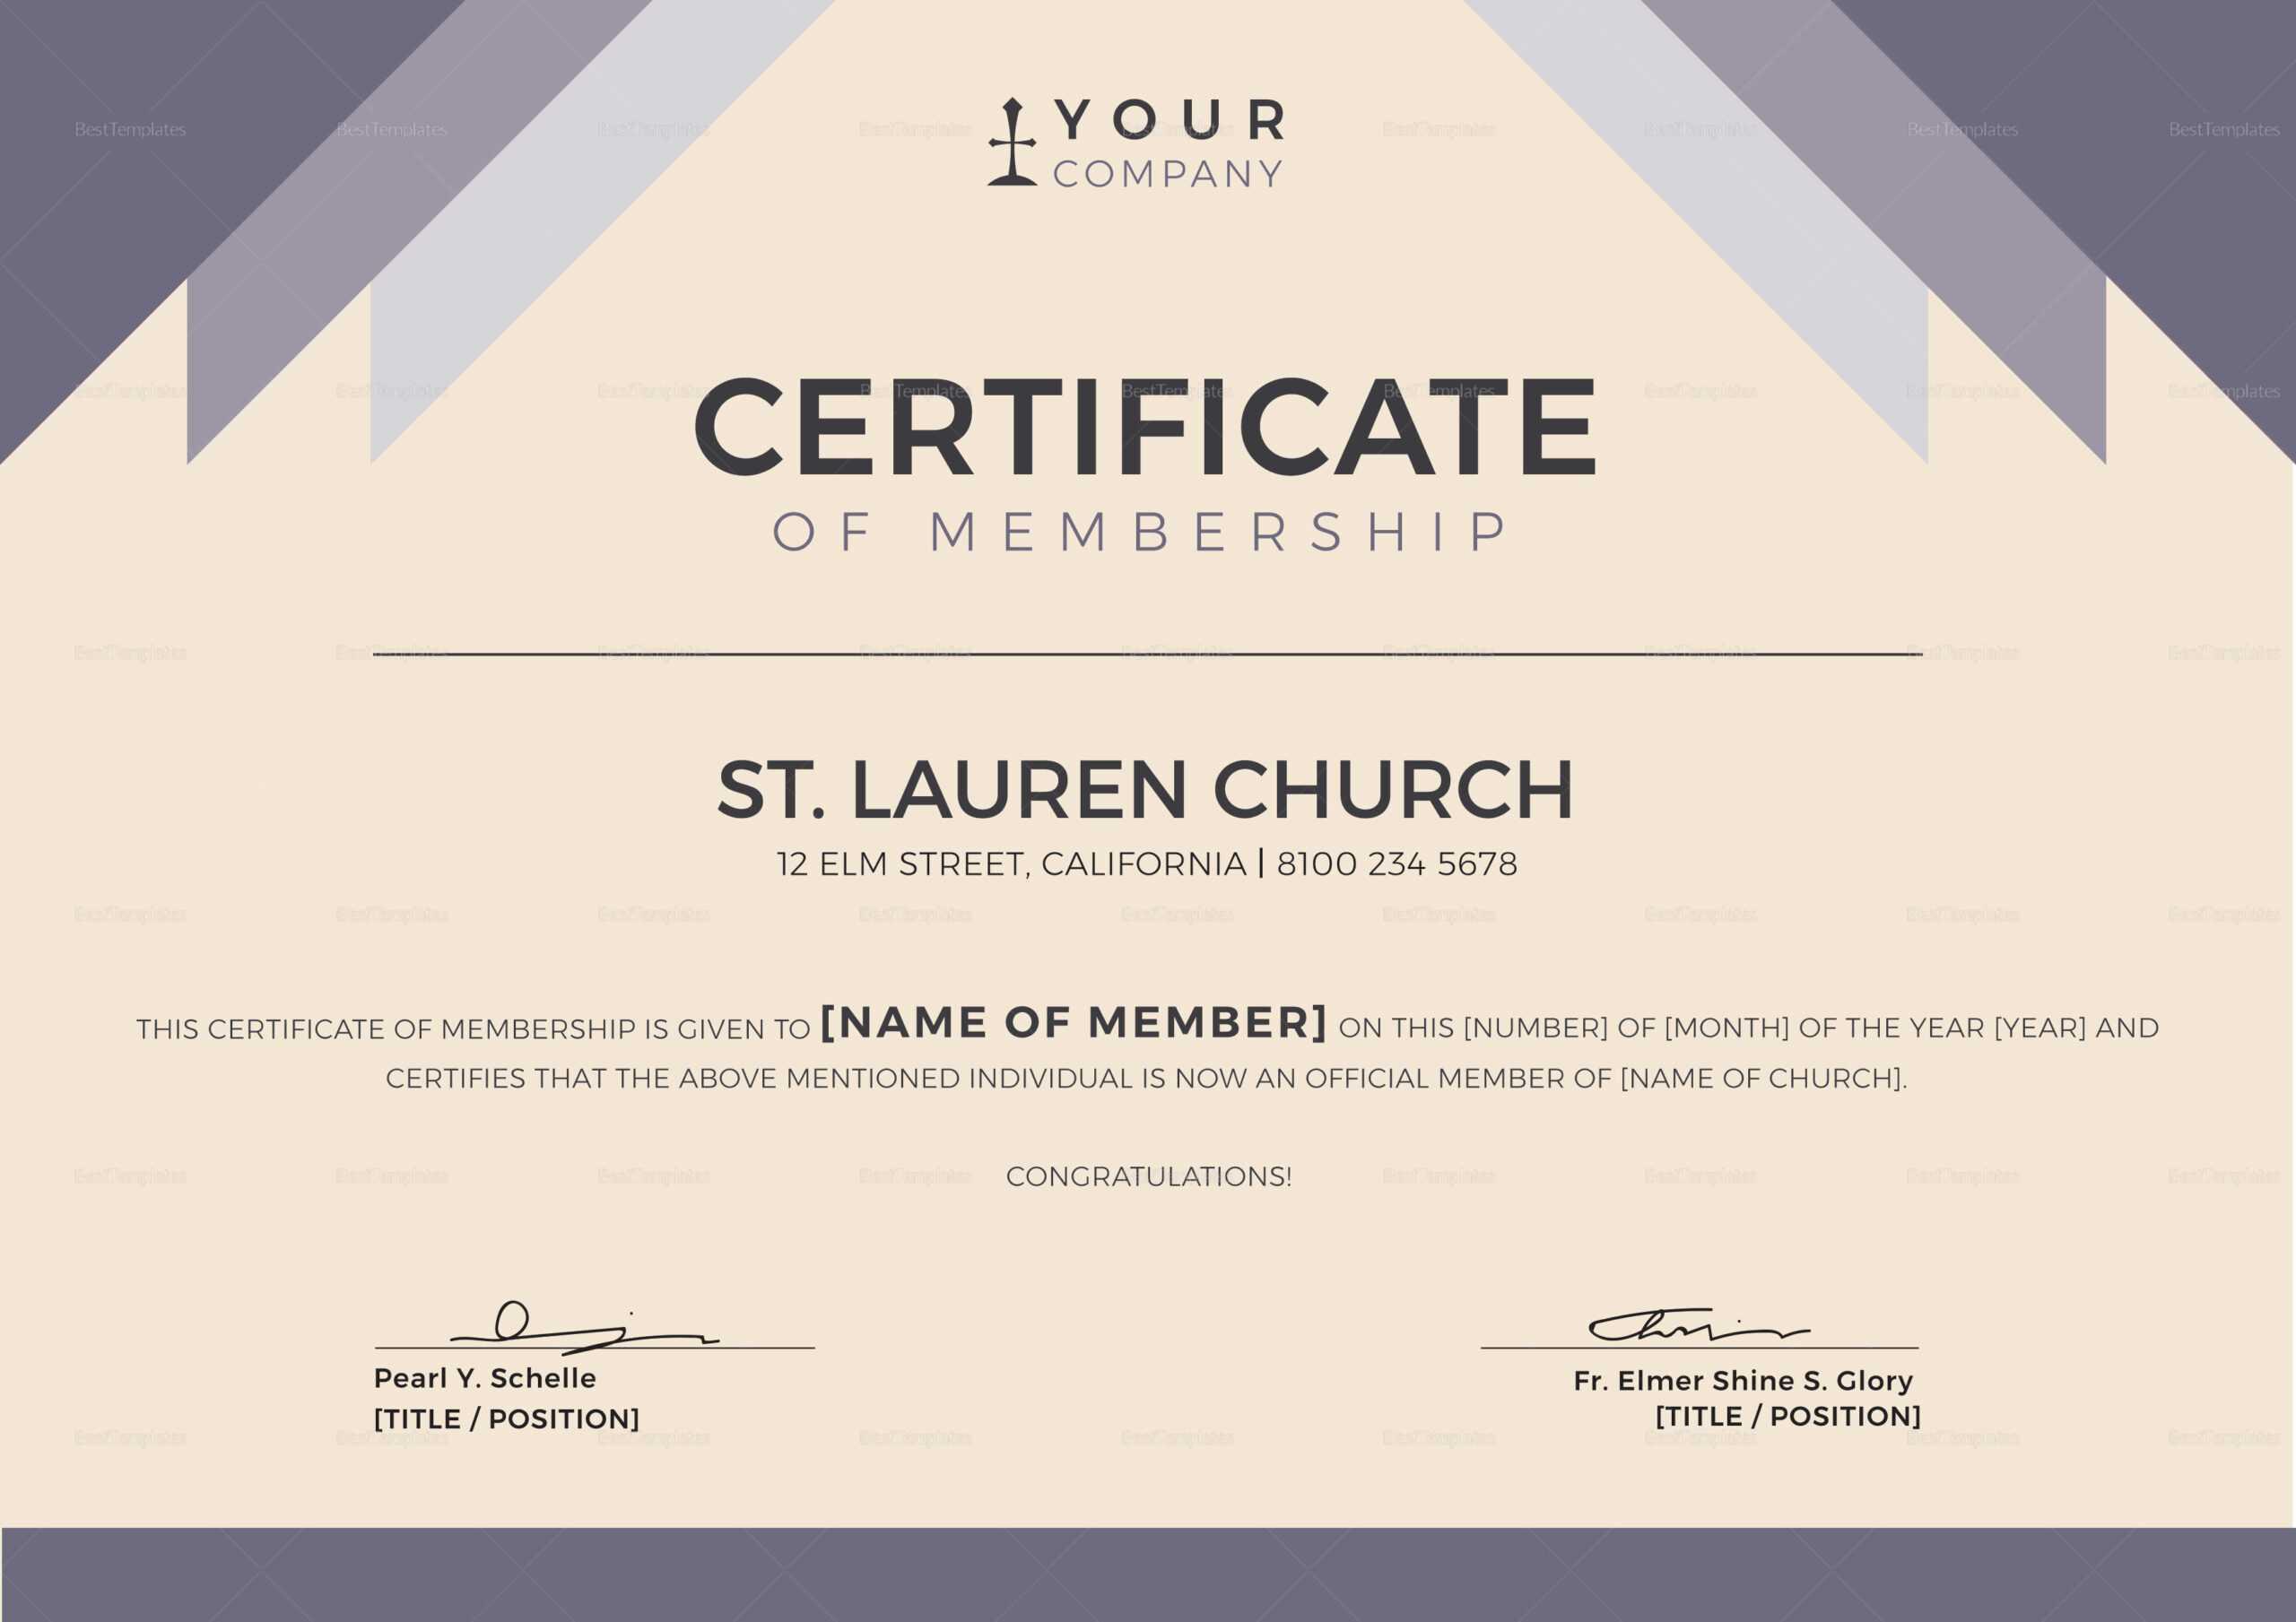 Church Membership Certificate Template Regarding New Member Certificate Template